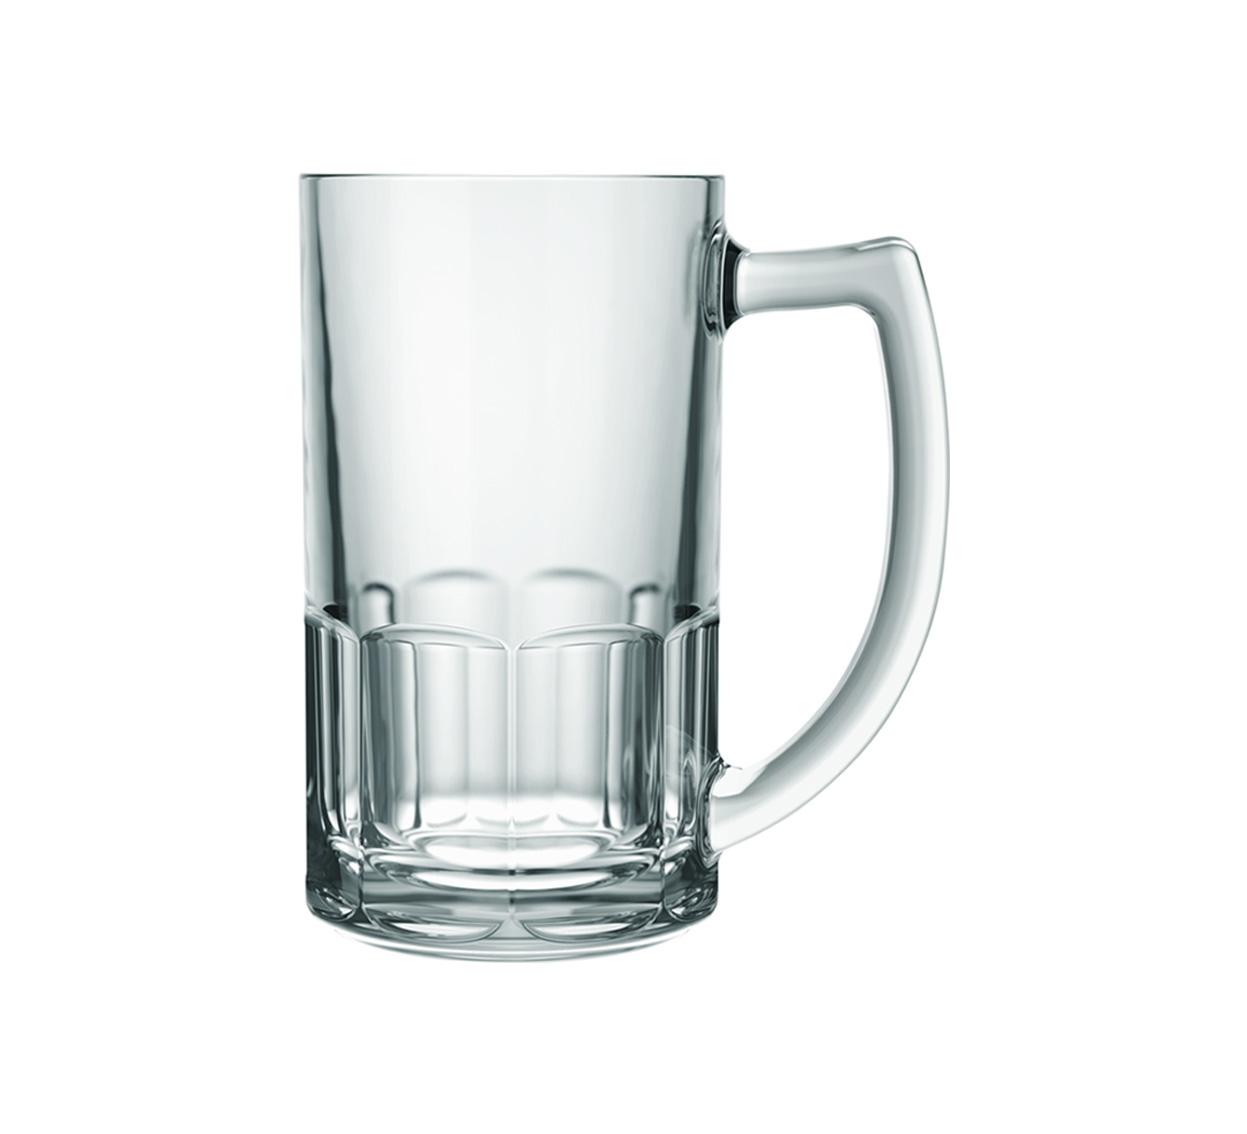 90b926d5b Caneca Bristol Cerveja 340 ml. Ref  N 5911. Linha Bristol Nadir Figueiredo